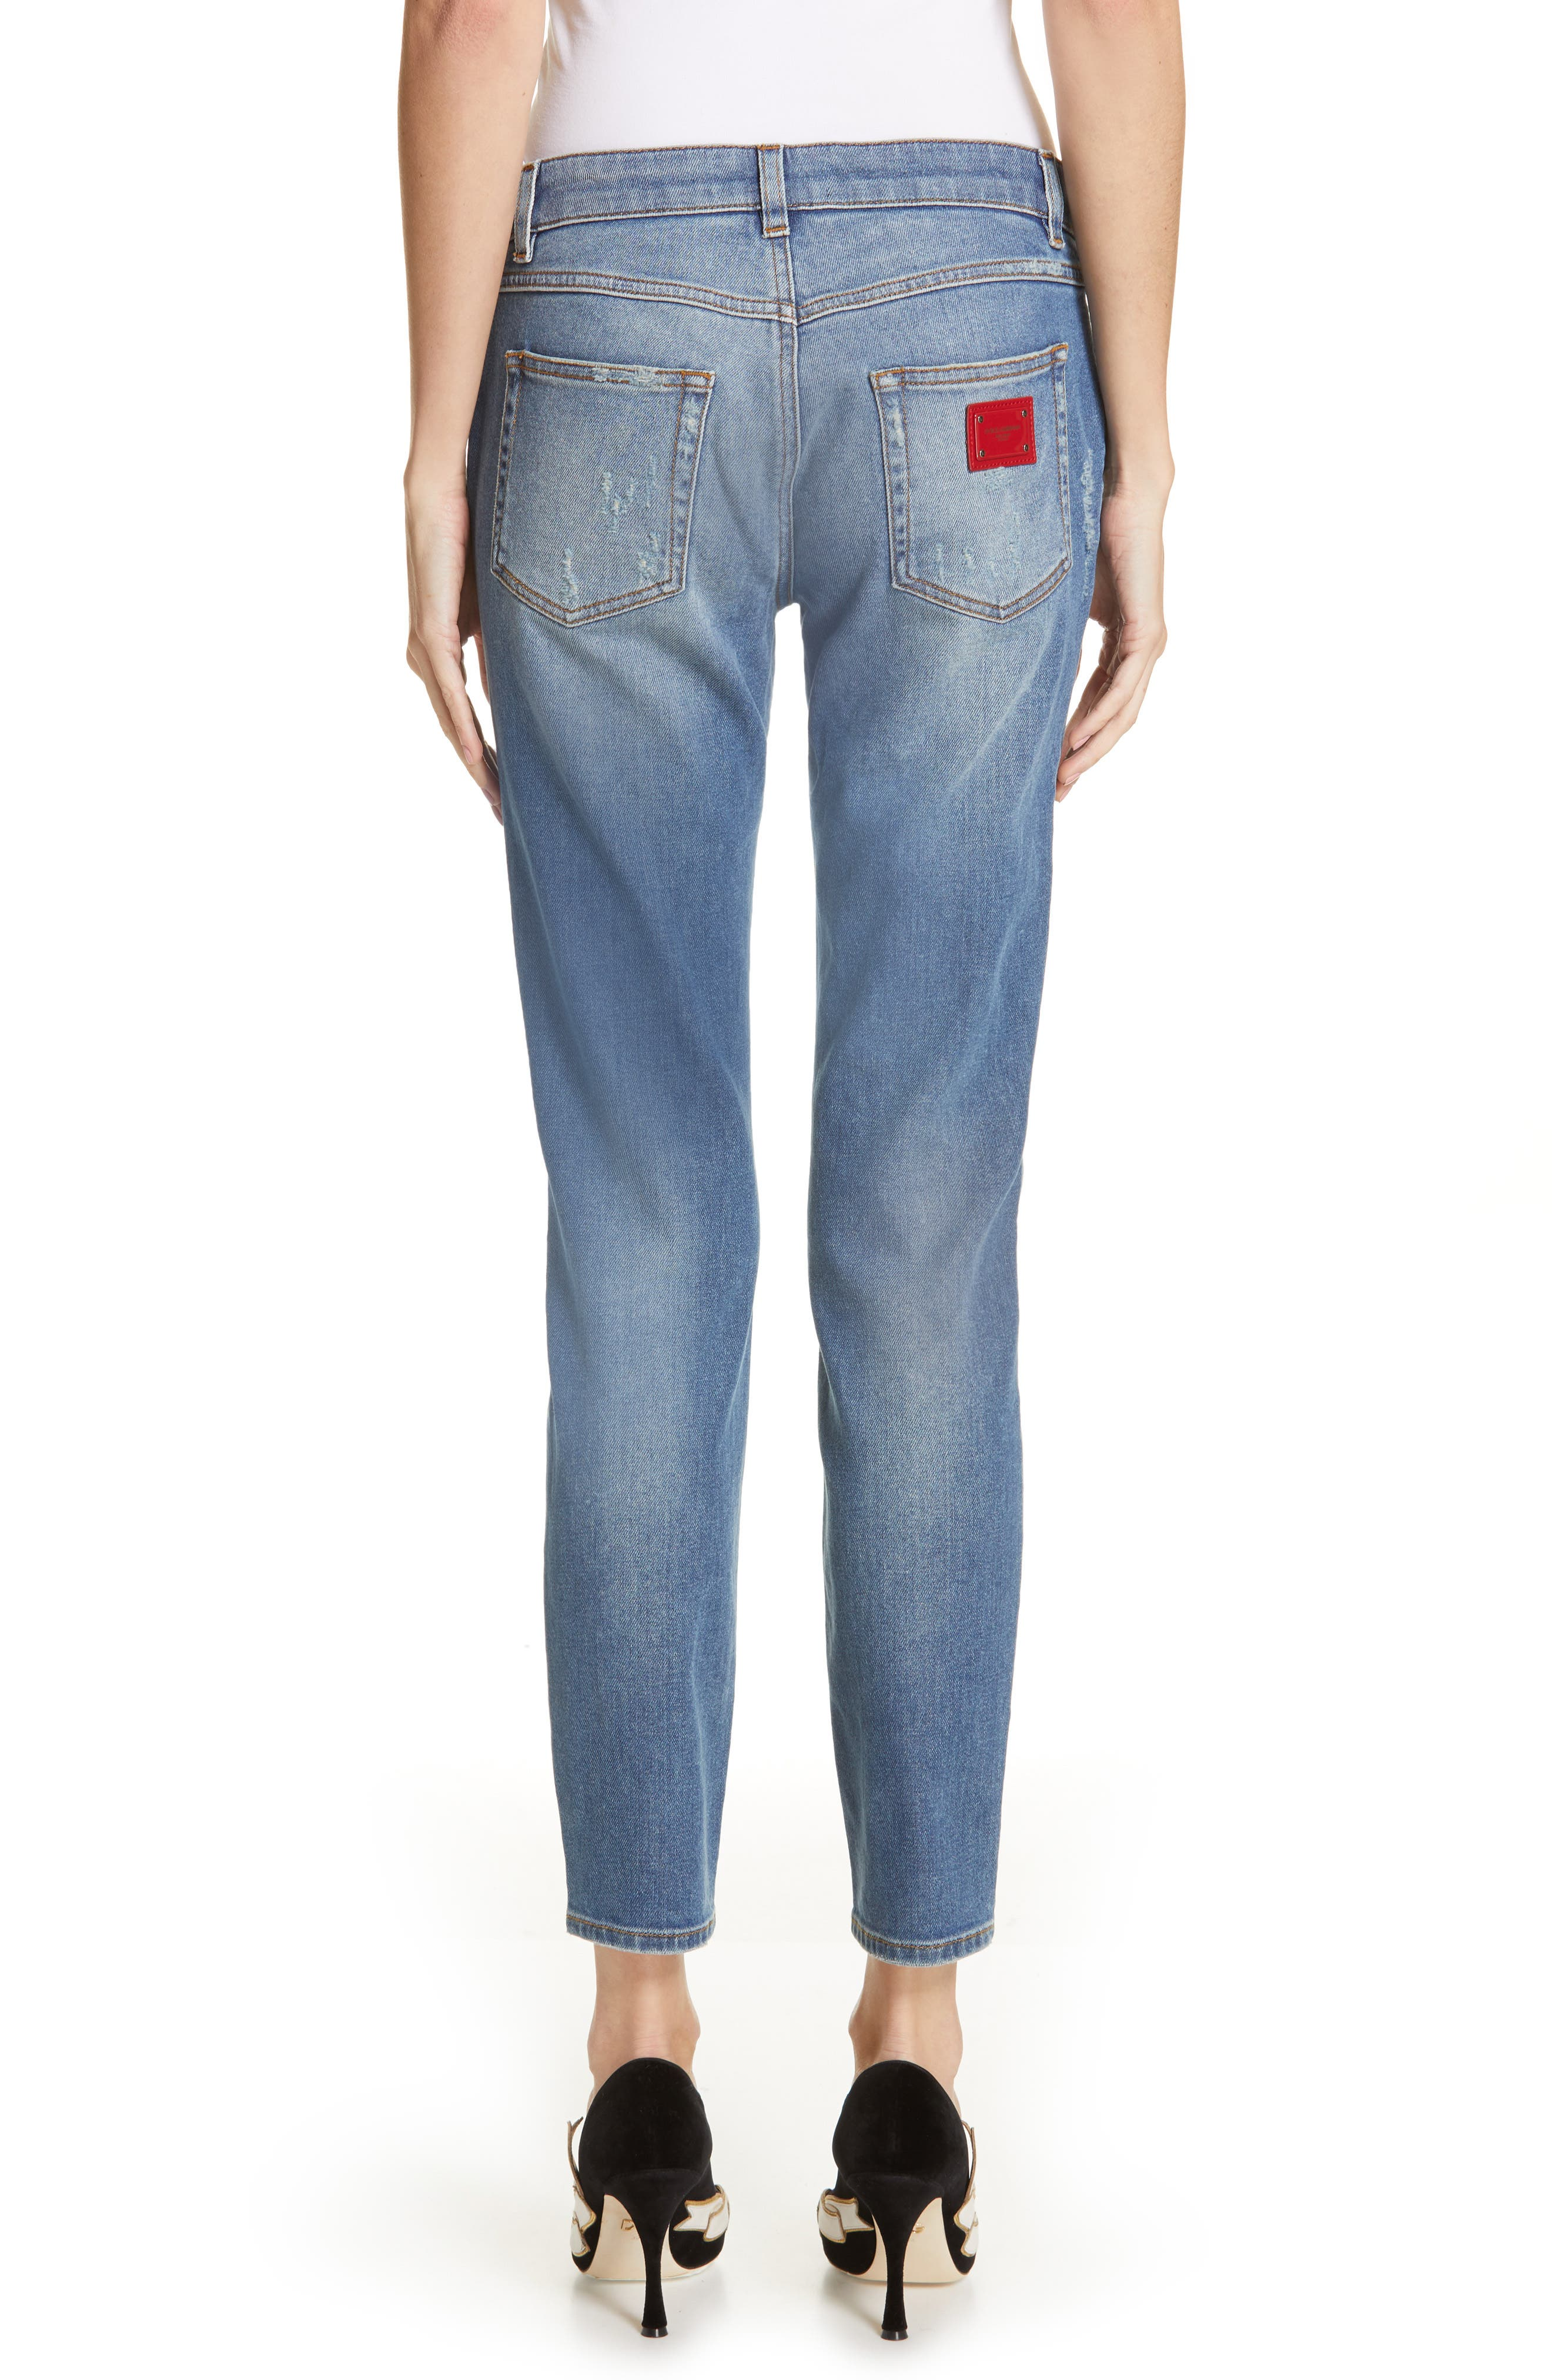 DOLCE&GABBANA, Logo Plaque Skinny Jeans, Alternate thumbnail 2, color, MED BLUE